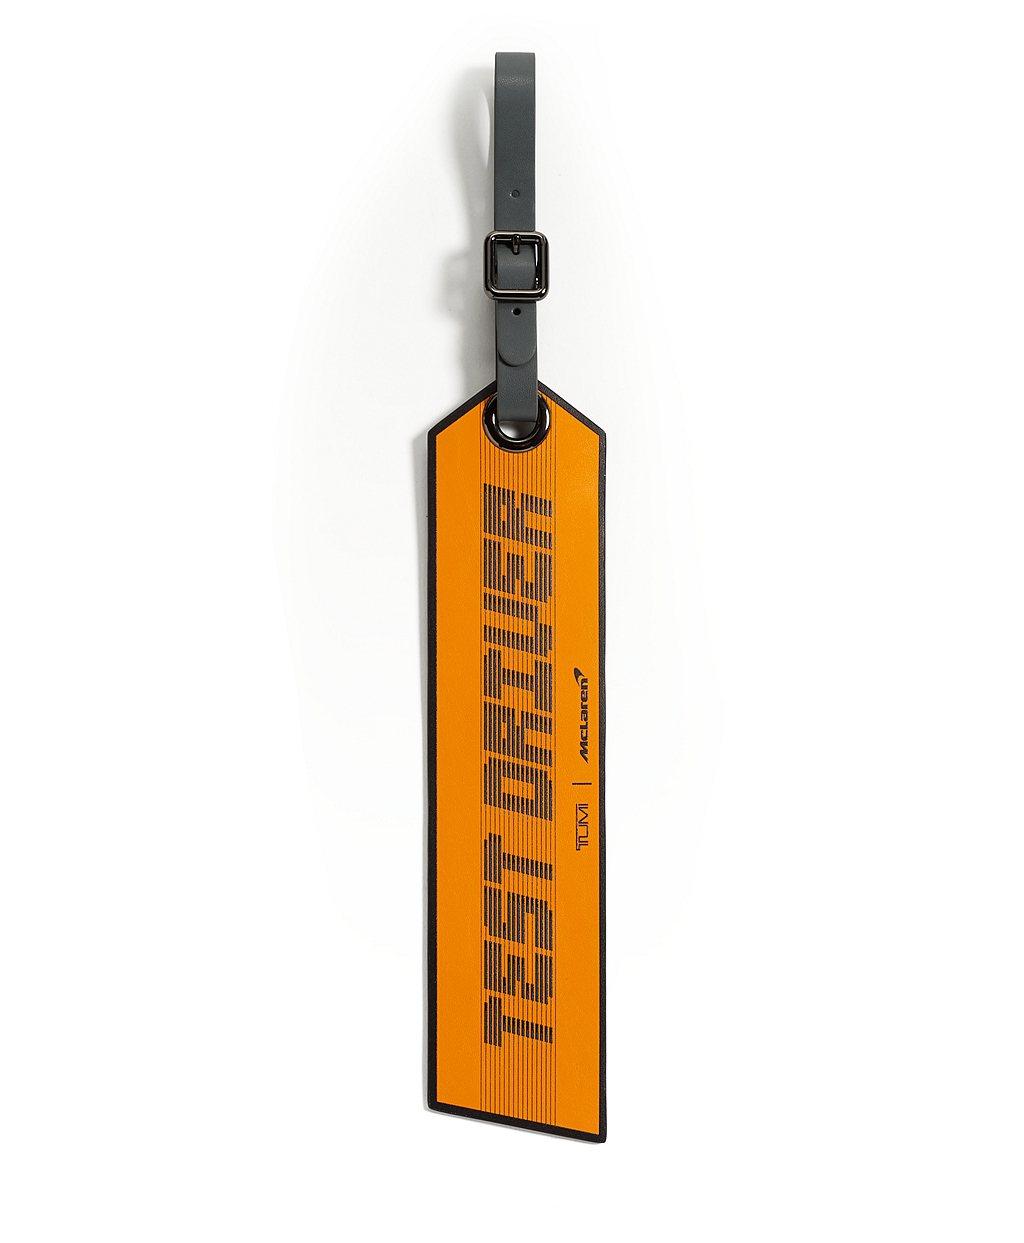 NIVOLET旅行箱吊牌-黑色NT3,500。 圖/TUMI提供